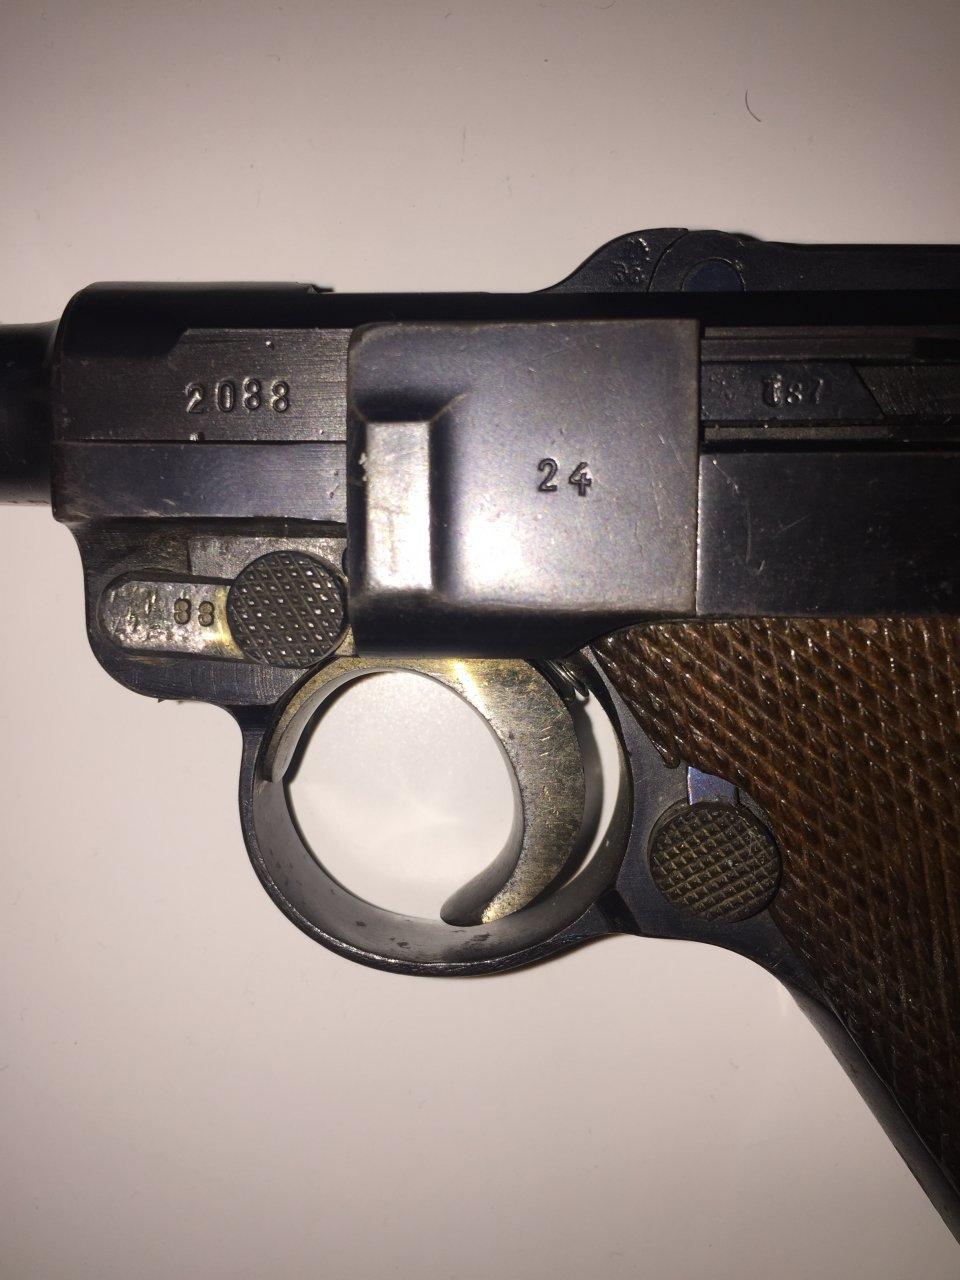 Luger   Gun Values Board